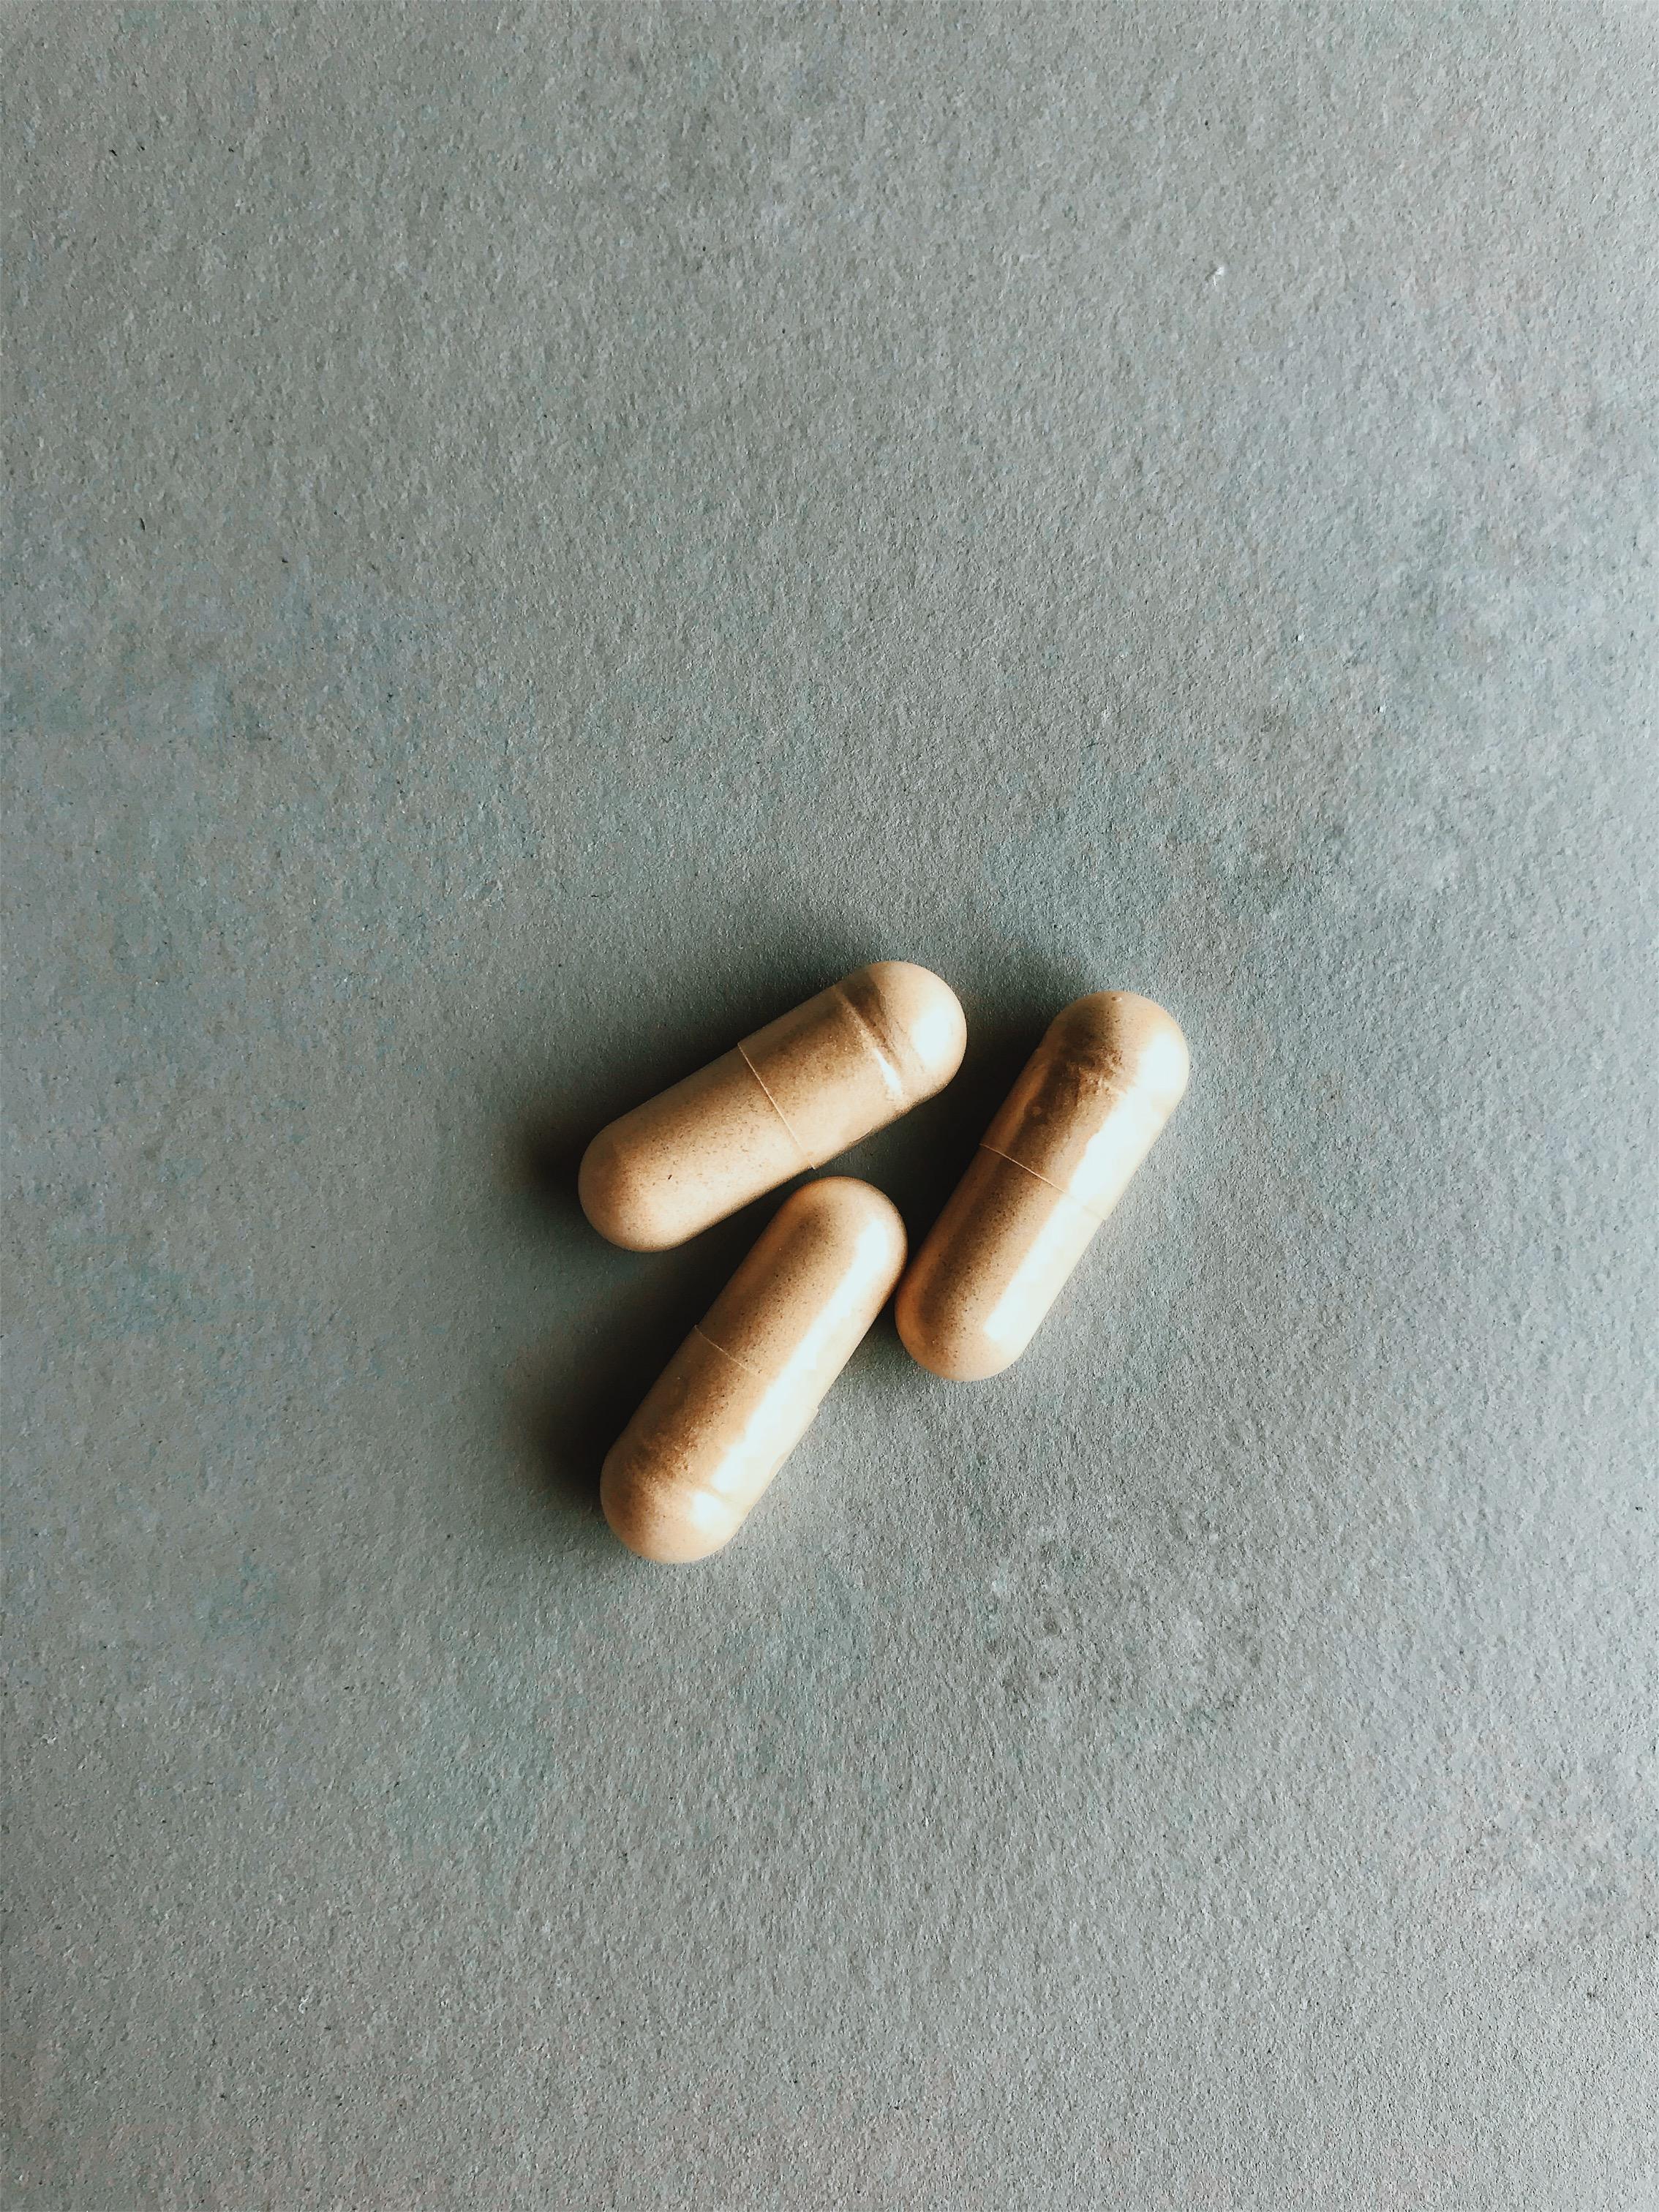 Cordyceps pills